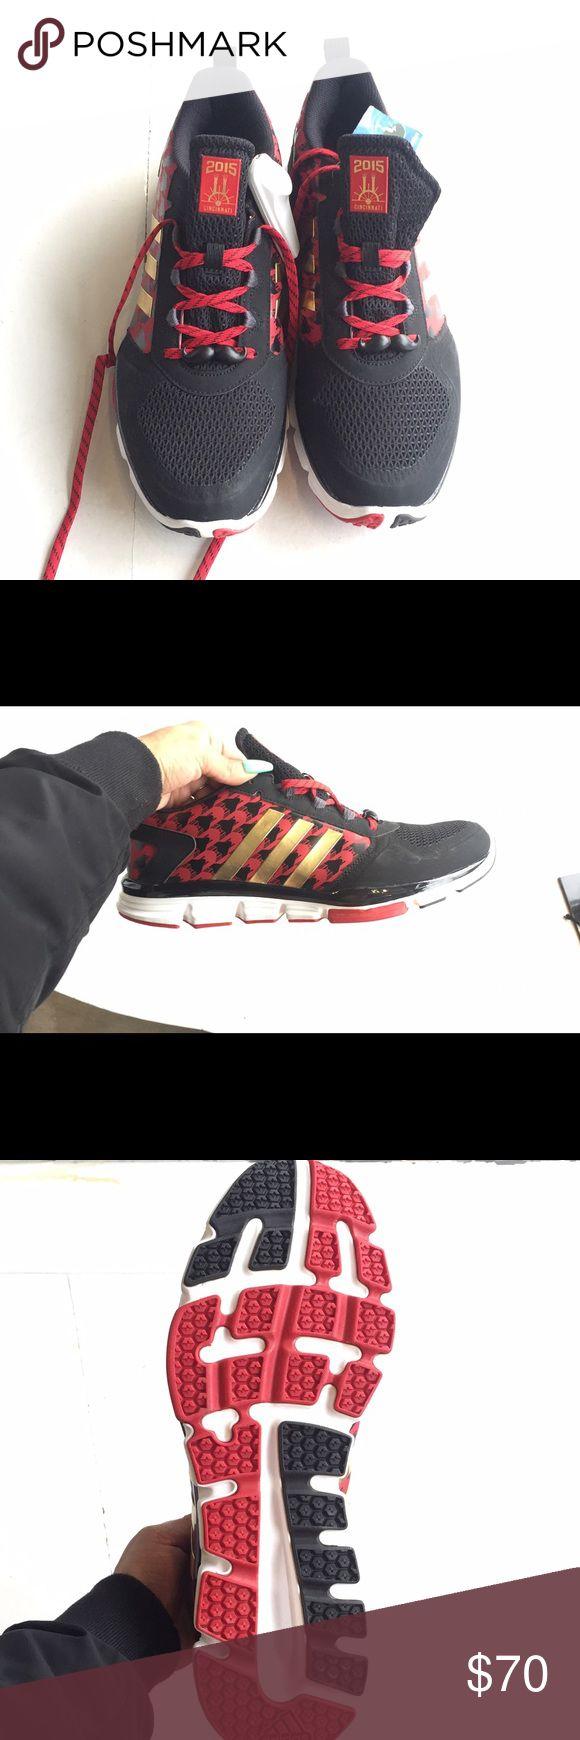 Adidas Tubular Nova Aliexpress